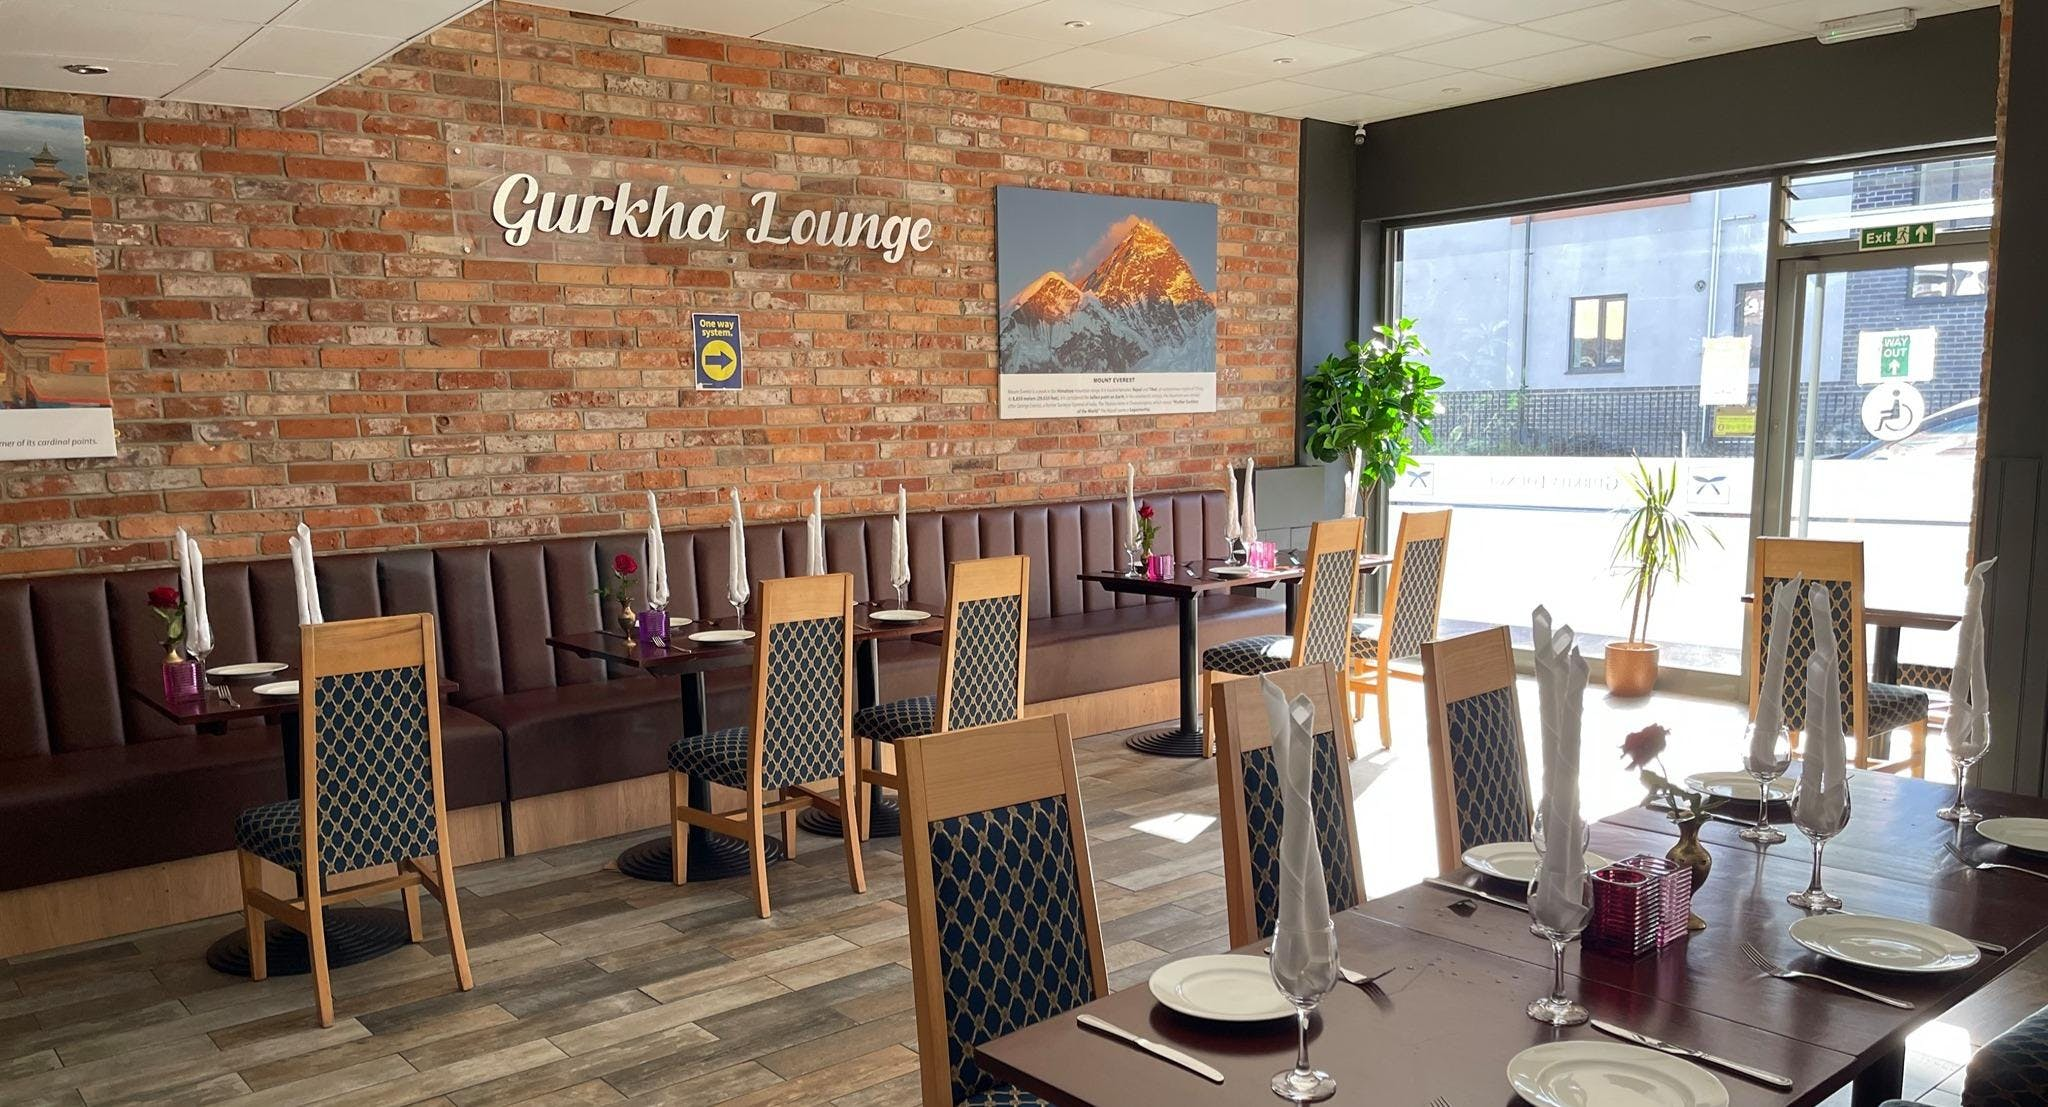 Photo of restaurant Gurkha Lounge - Southampton in Bevois, Southampton